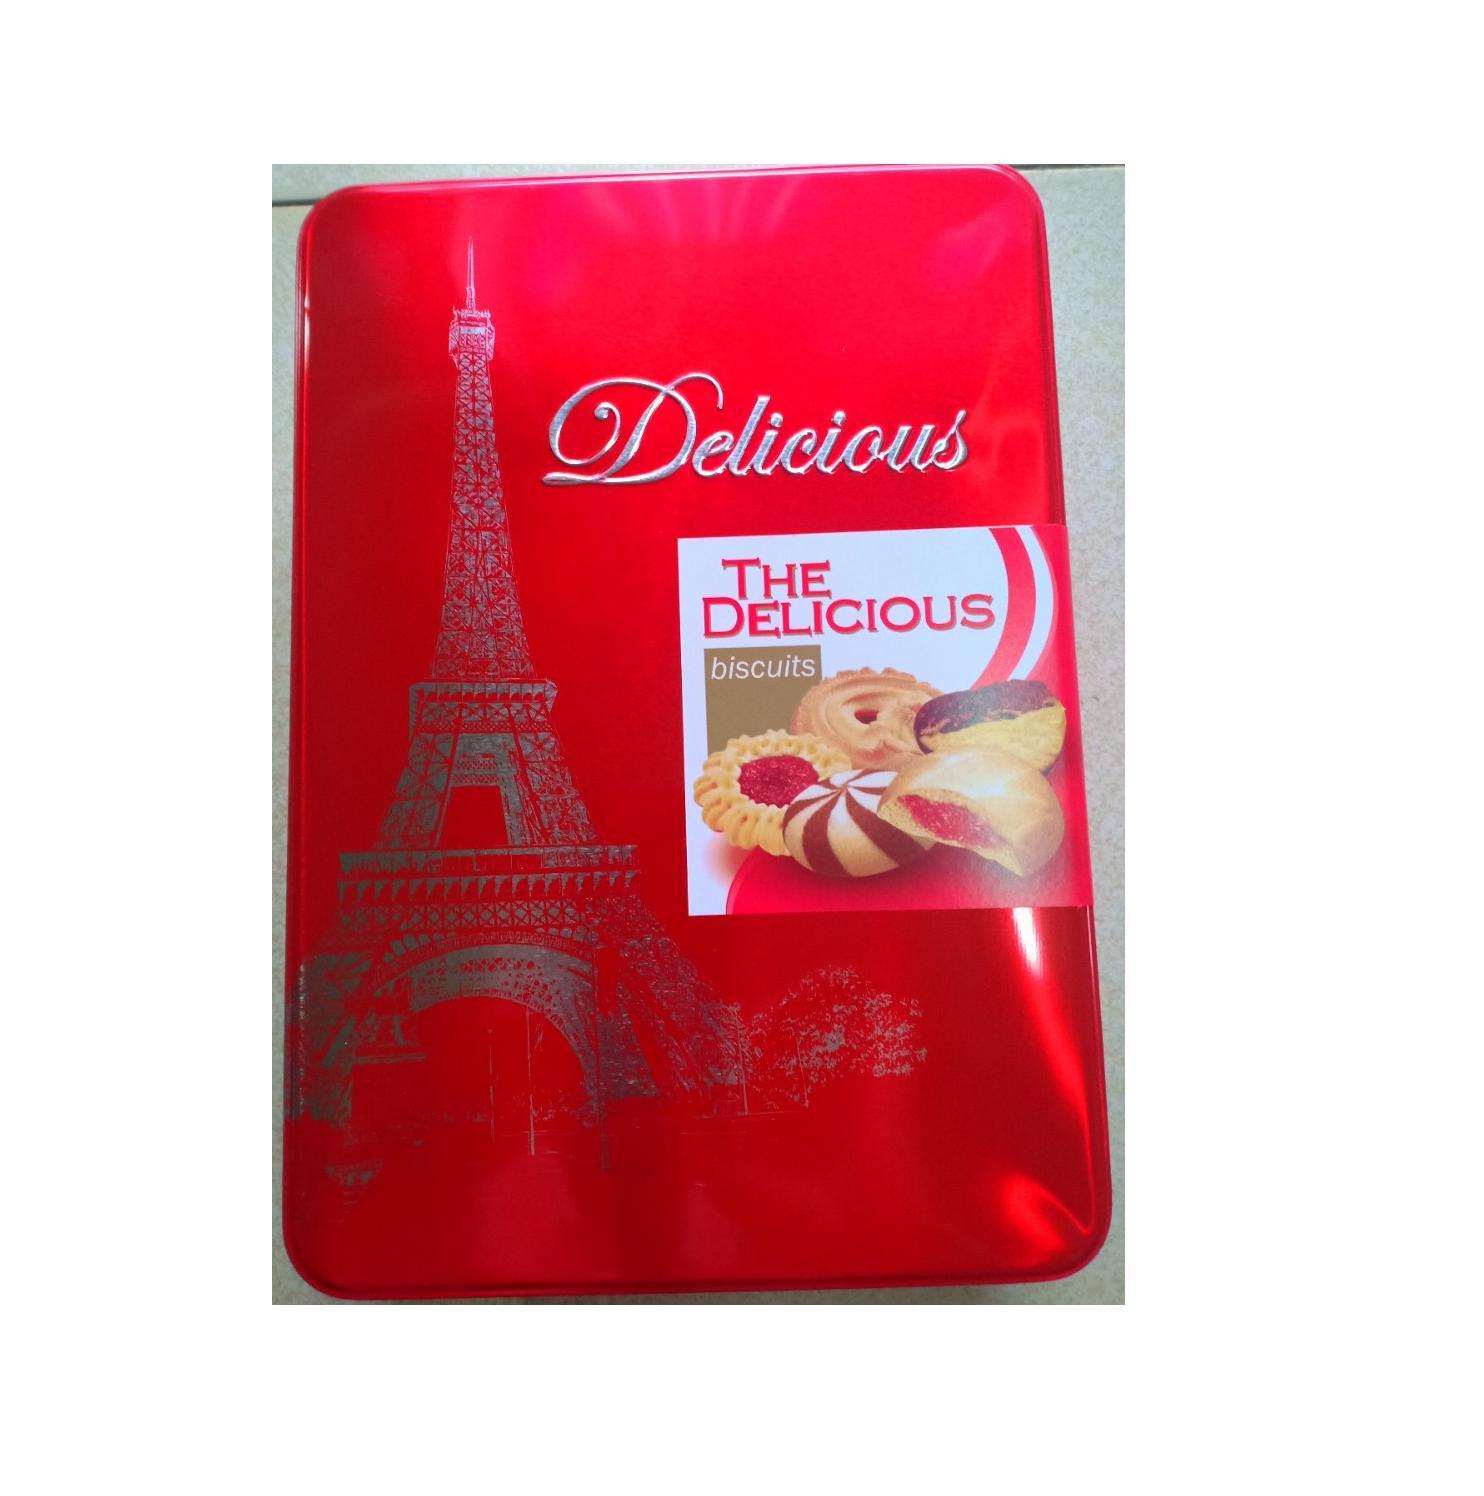 Bánh Ola - Eiffel vị dâu 430g